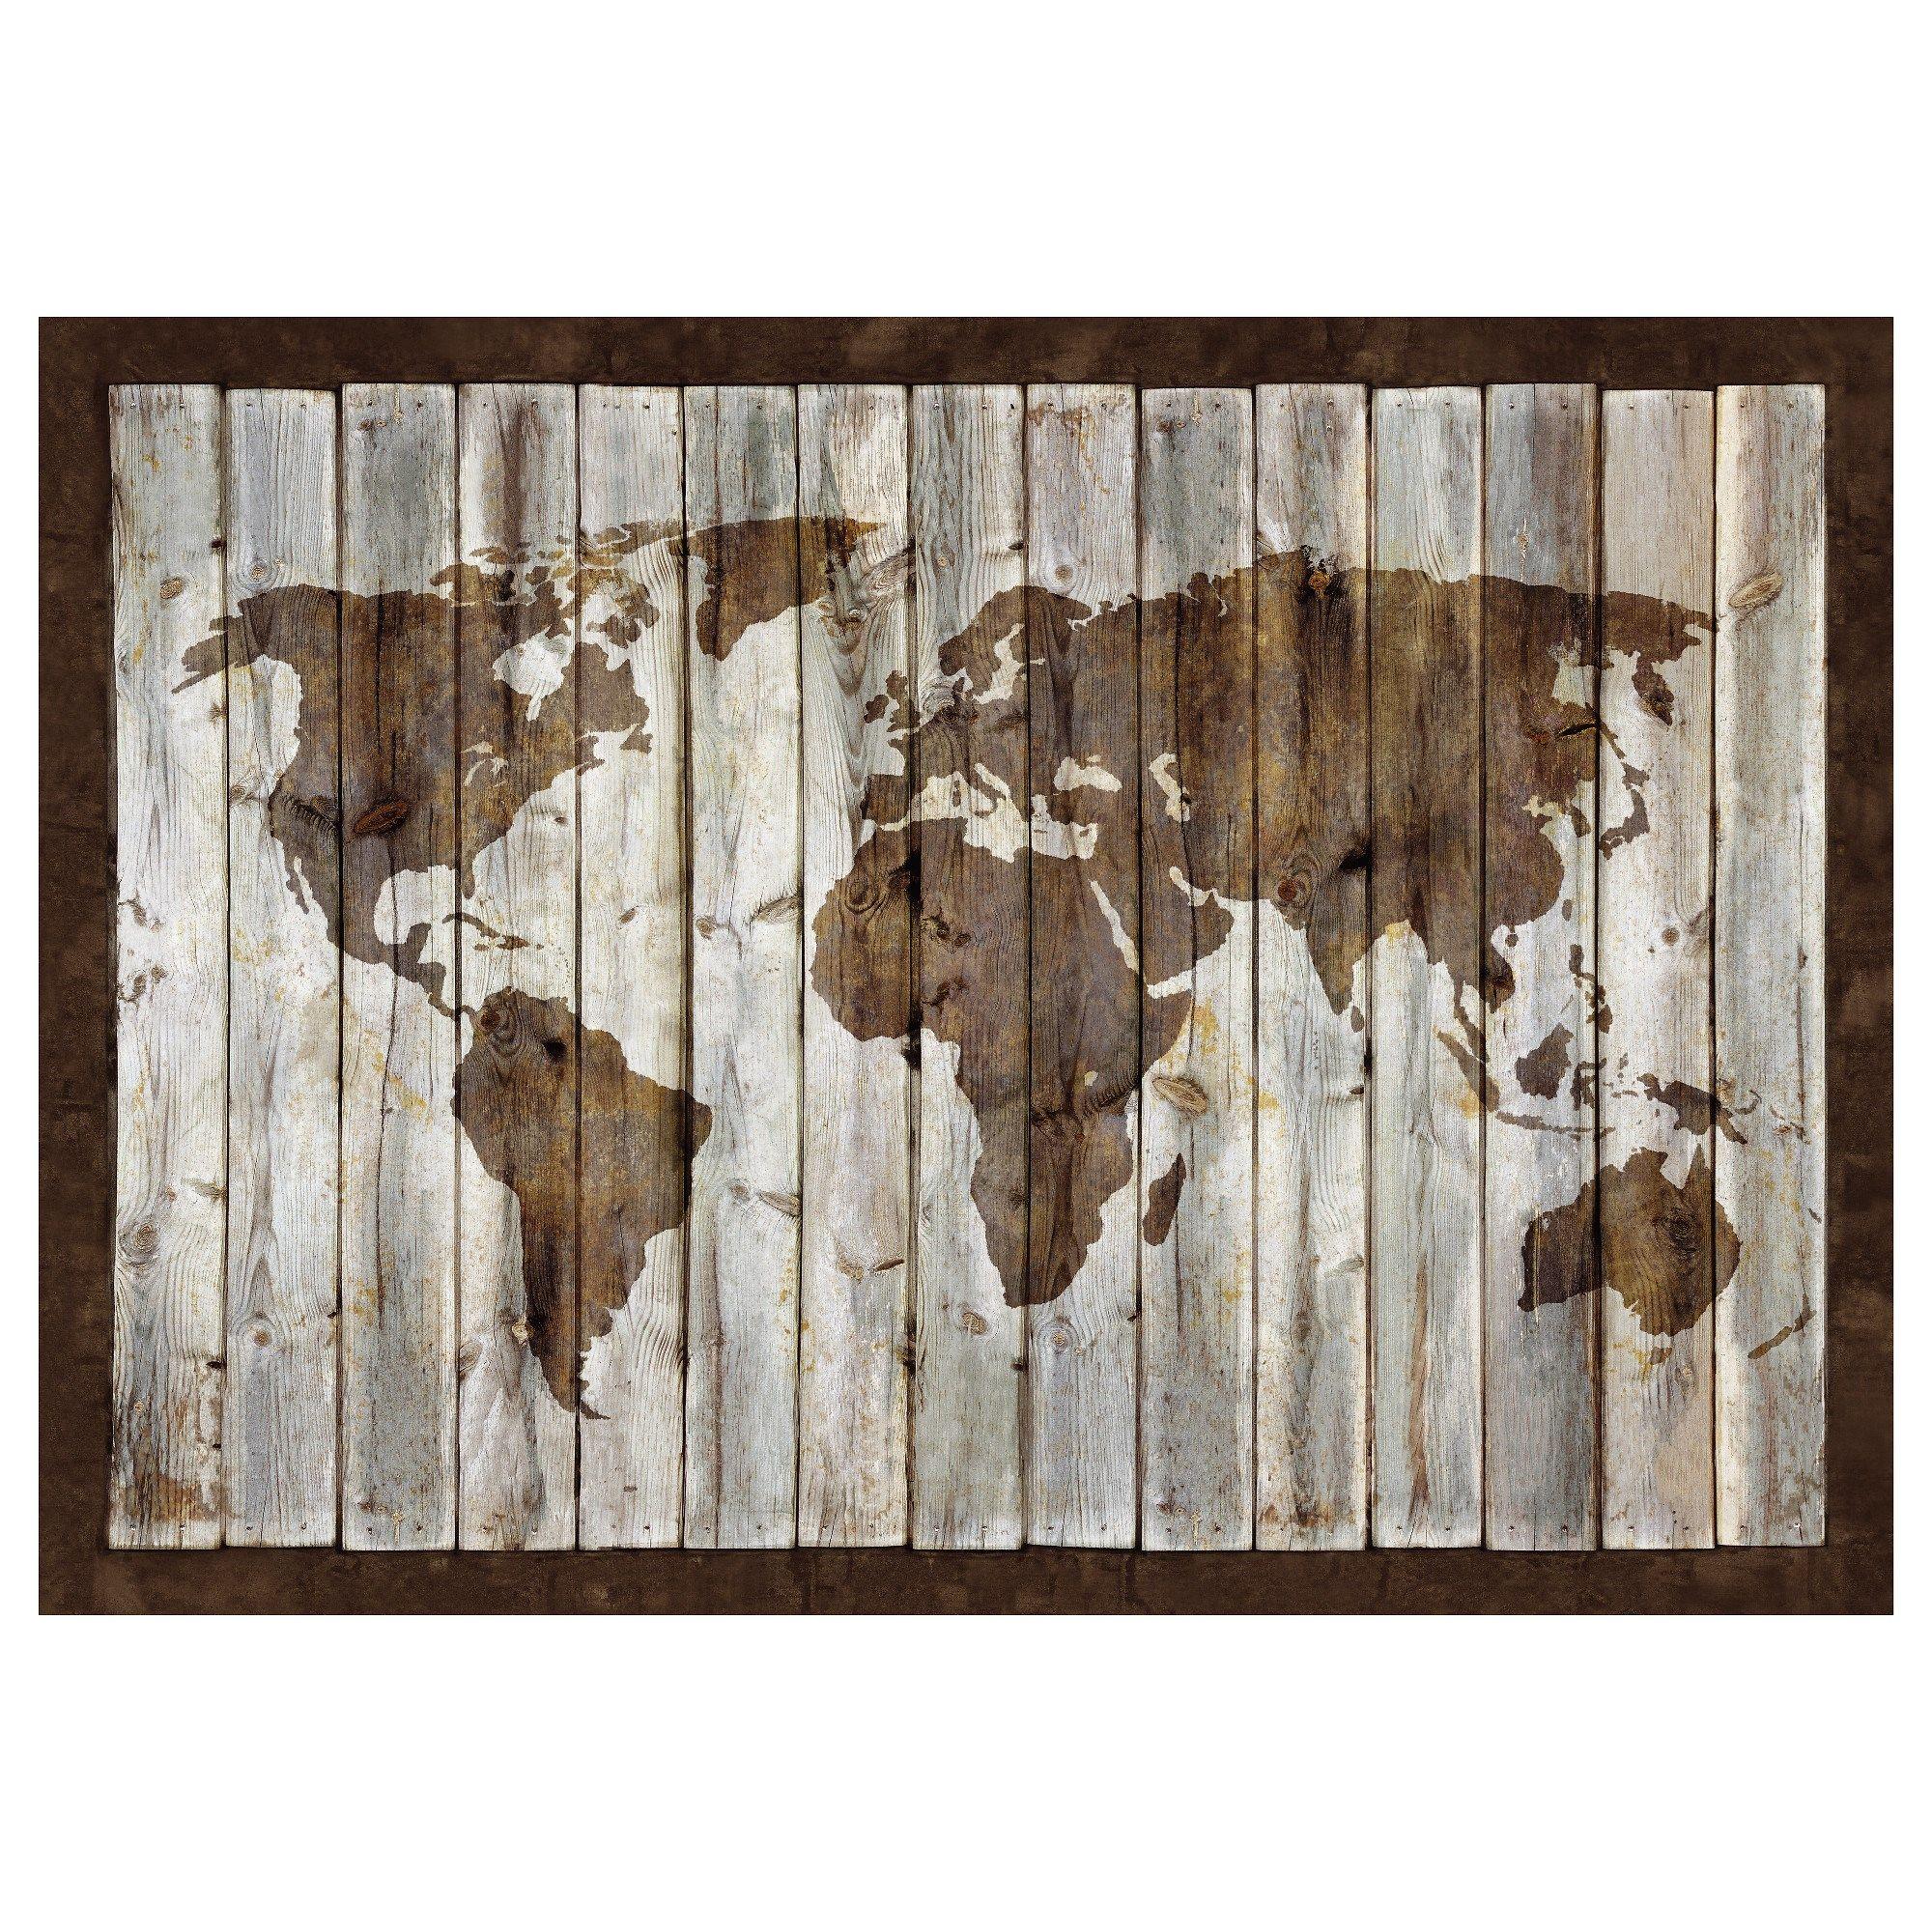 bj rksta resim 179 tahtalardan harita 200x140 cm link. Black Bedroom Furniture Sets. Home Design Ideas